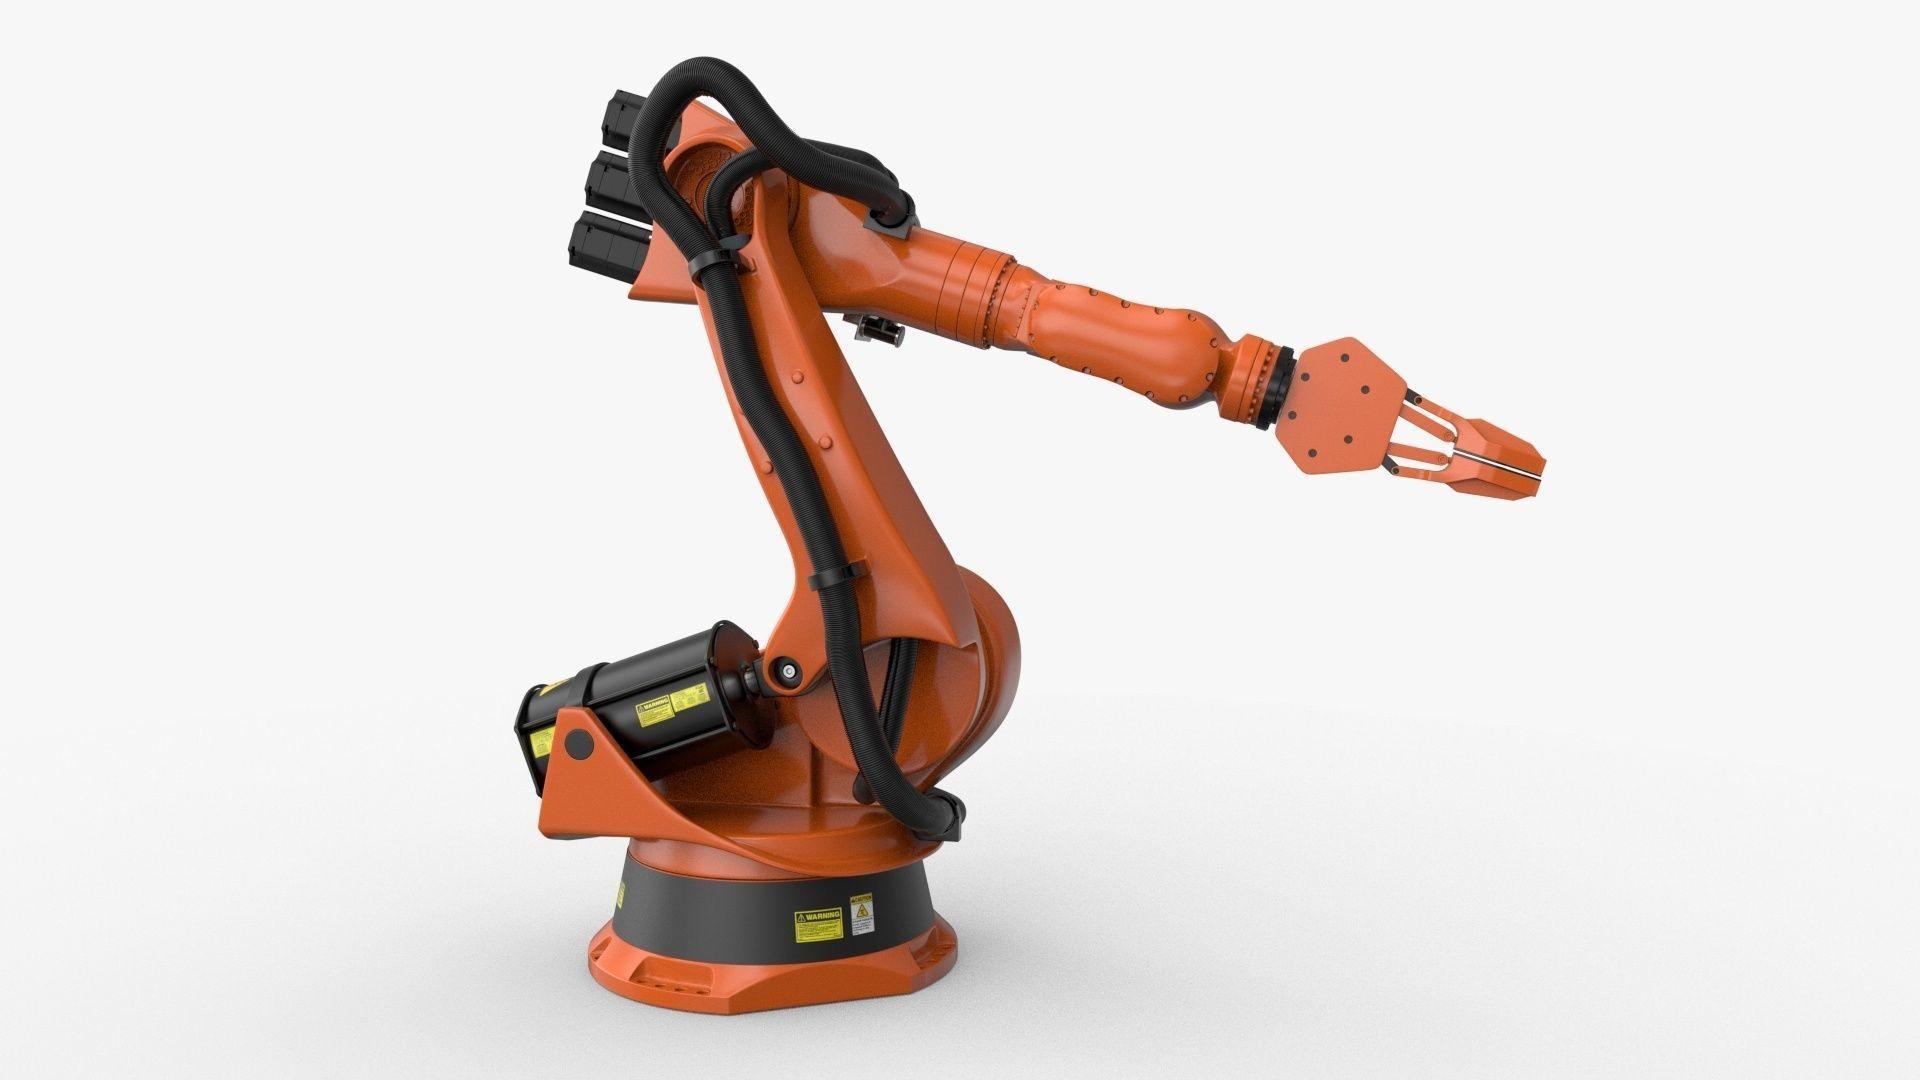 KUKA 210 2 Cinema 4D Rigged industrial robotic arm